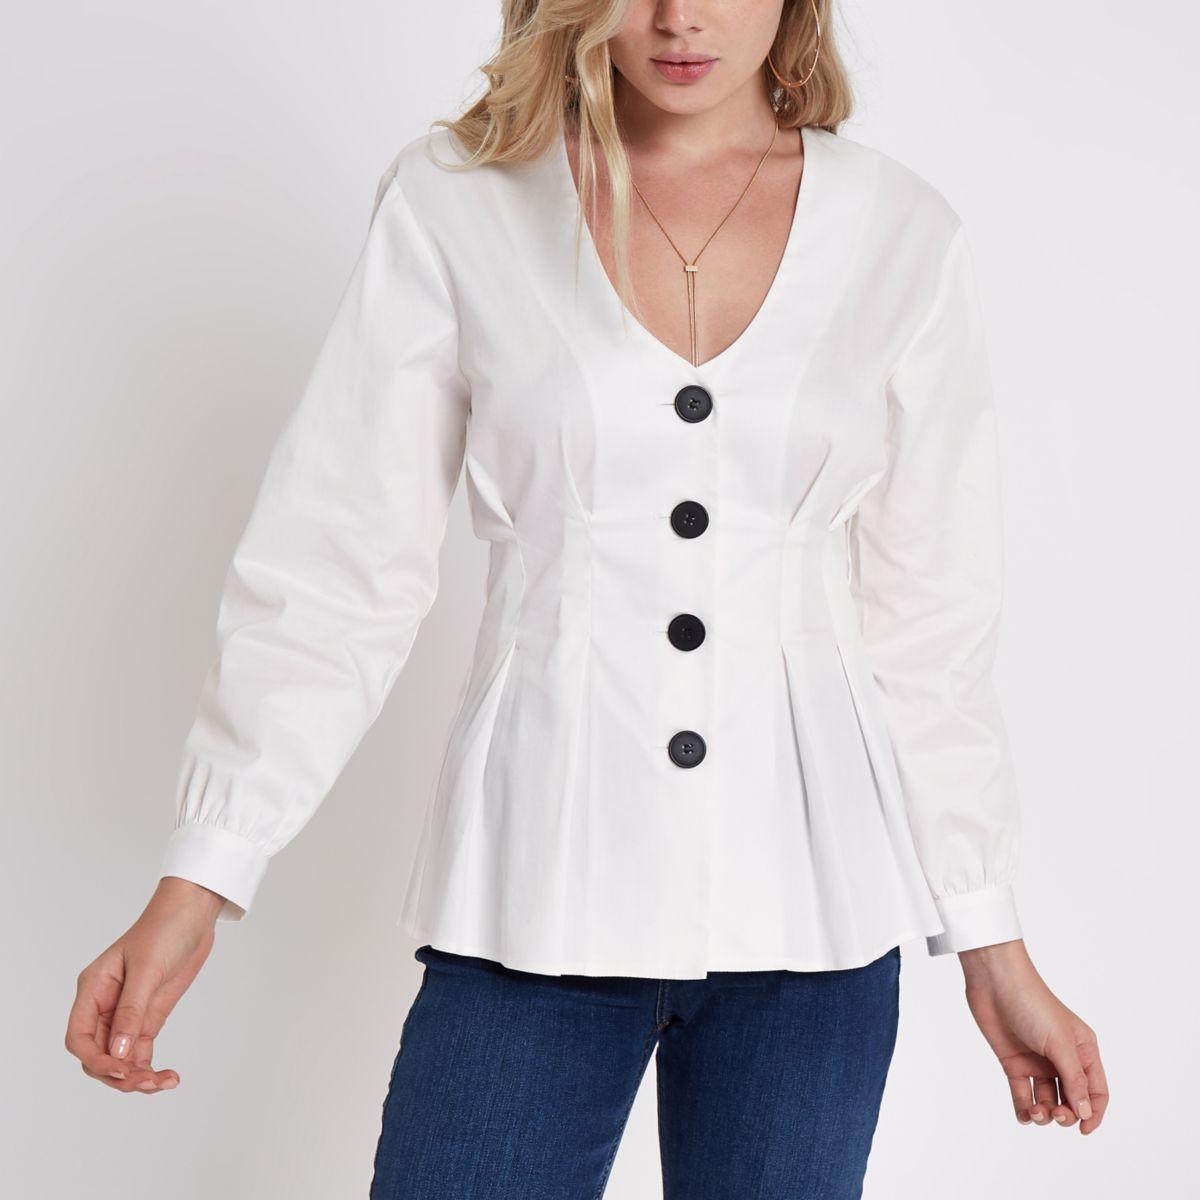 White V neck button front blouse